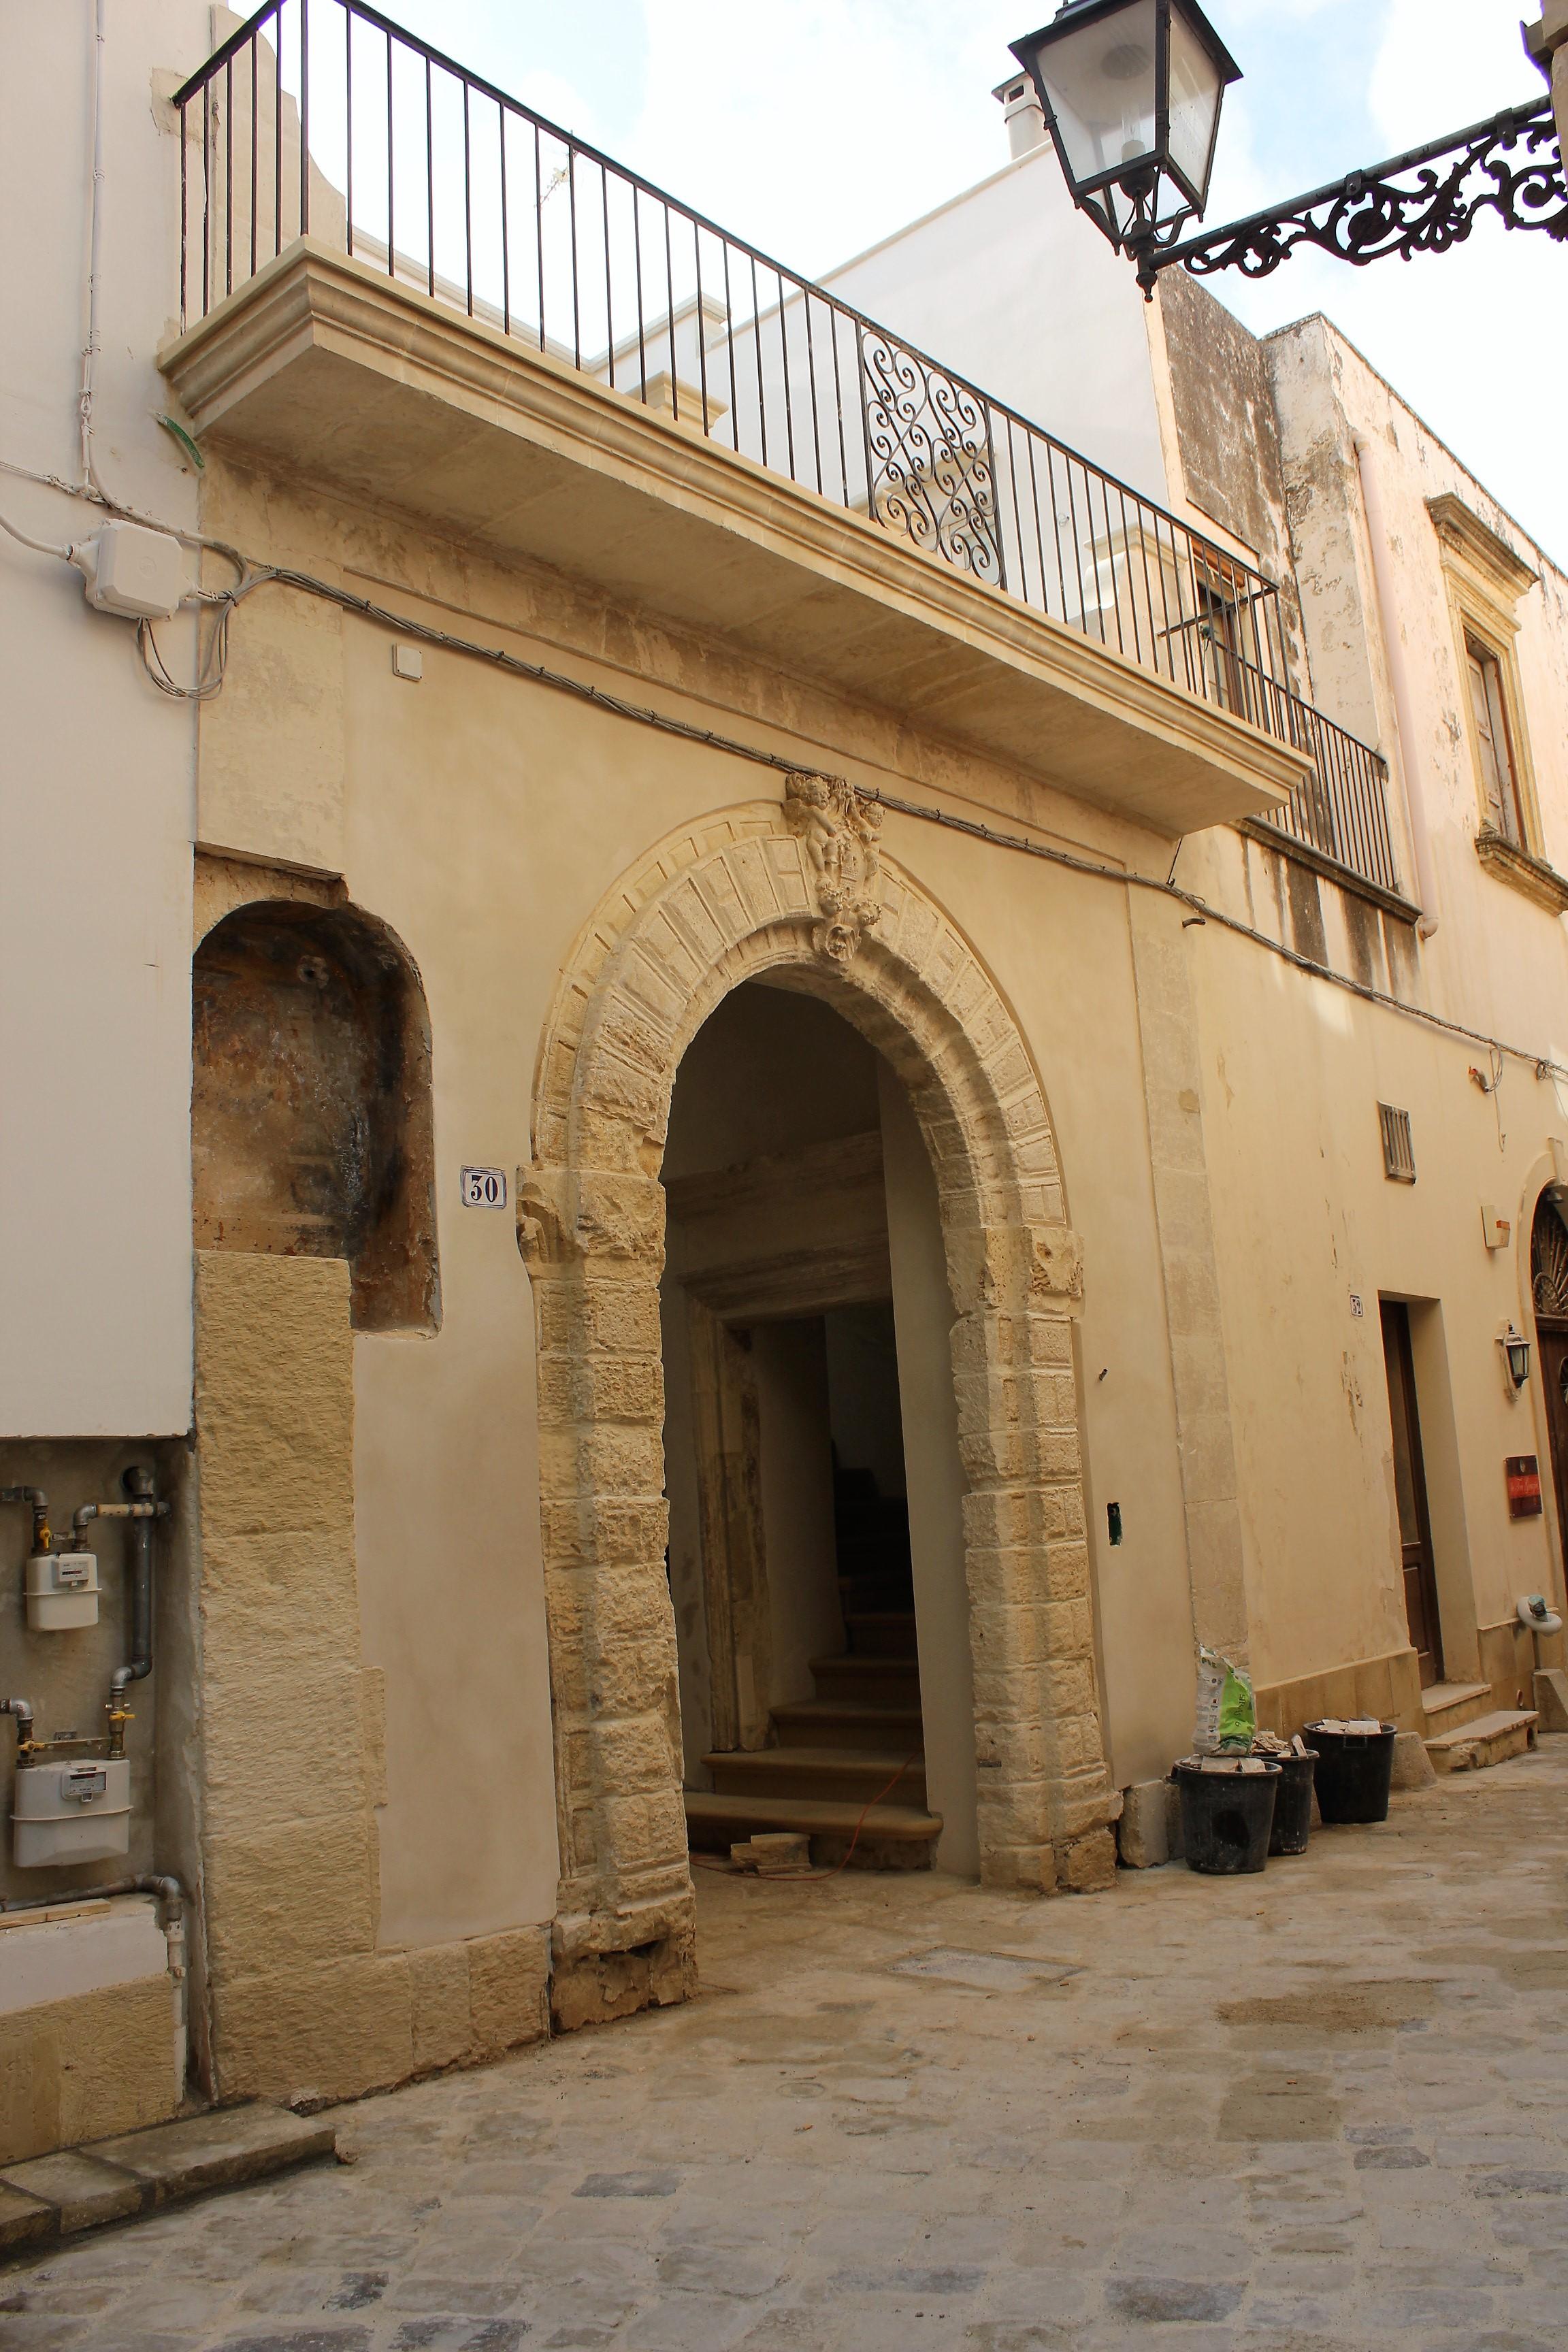 Galatina. Palazzo Mory, il recupero e la scoperta